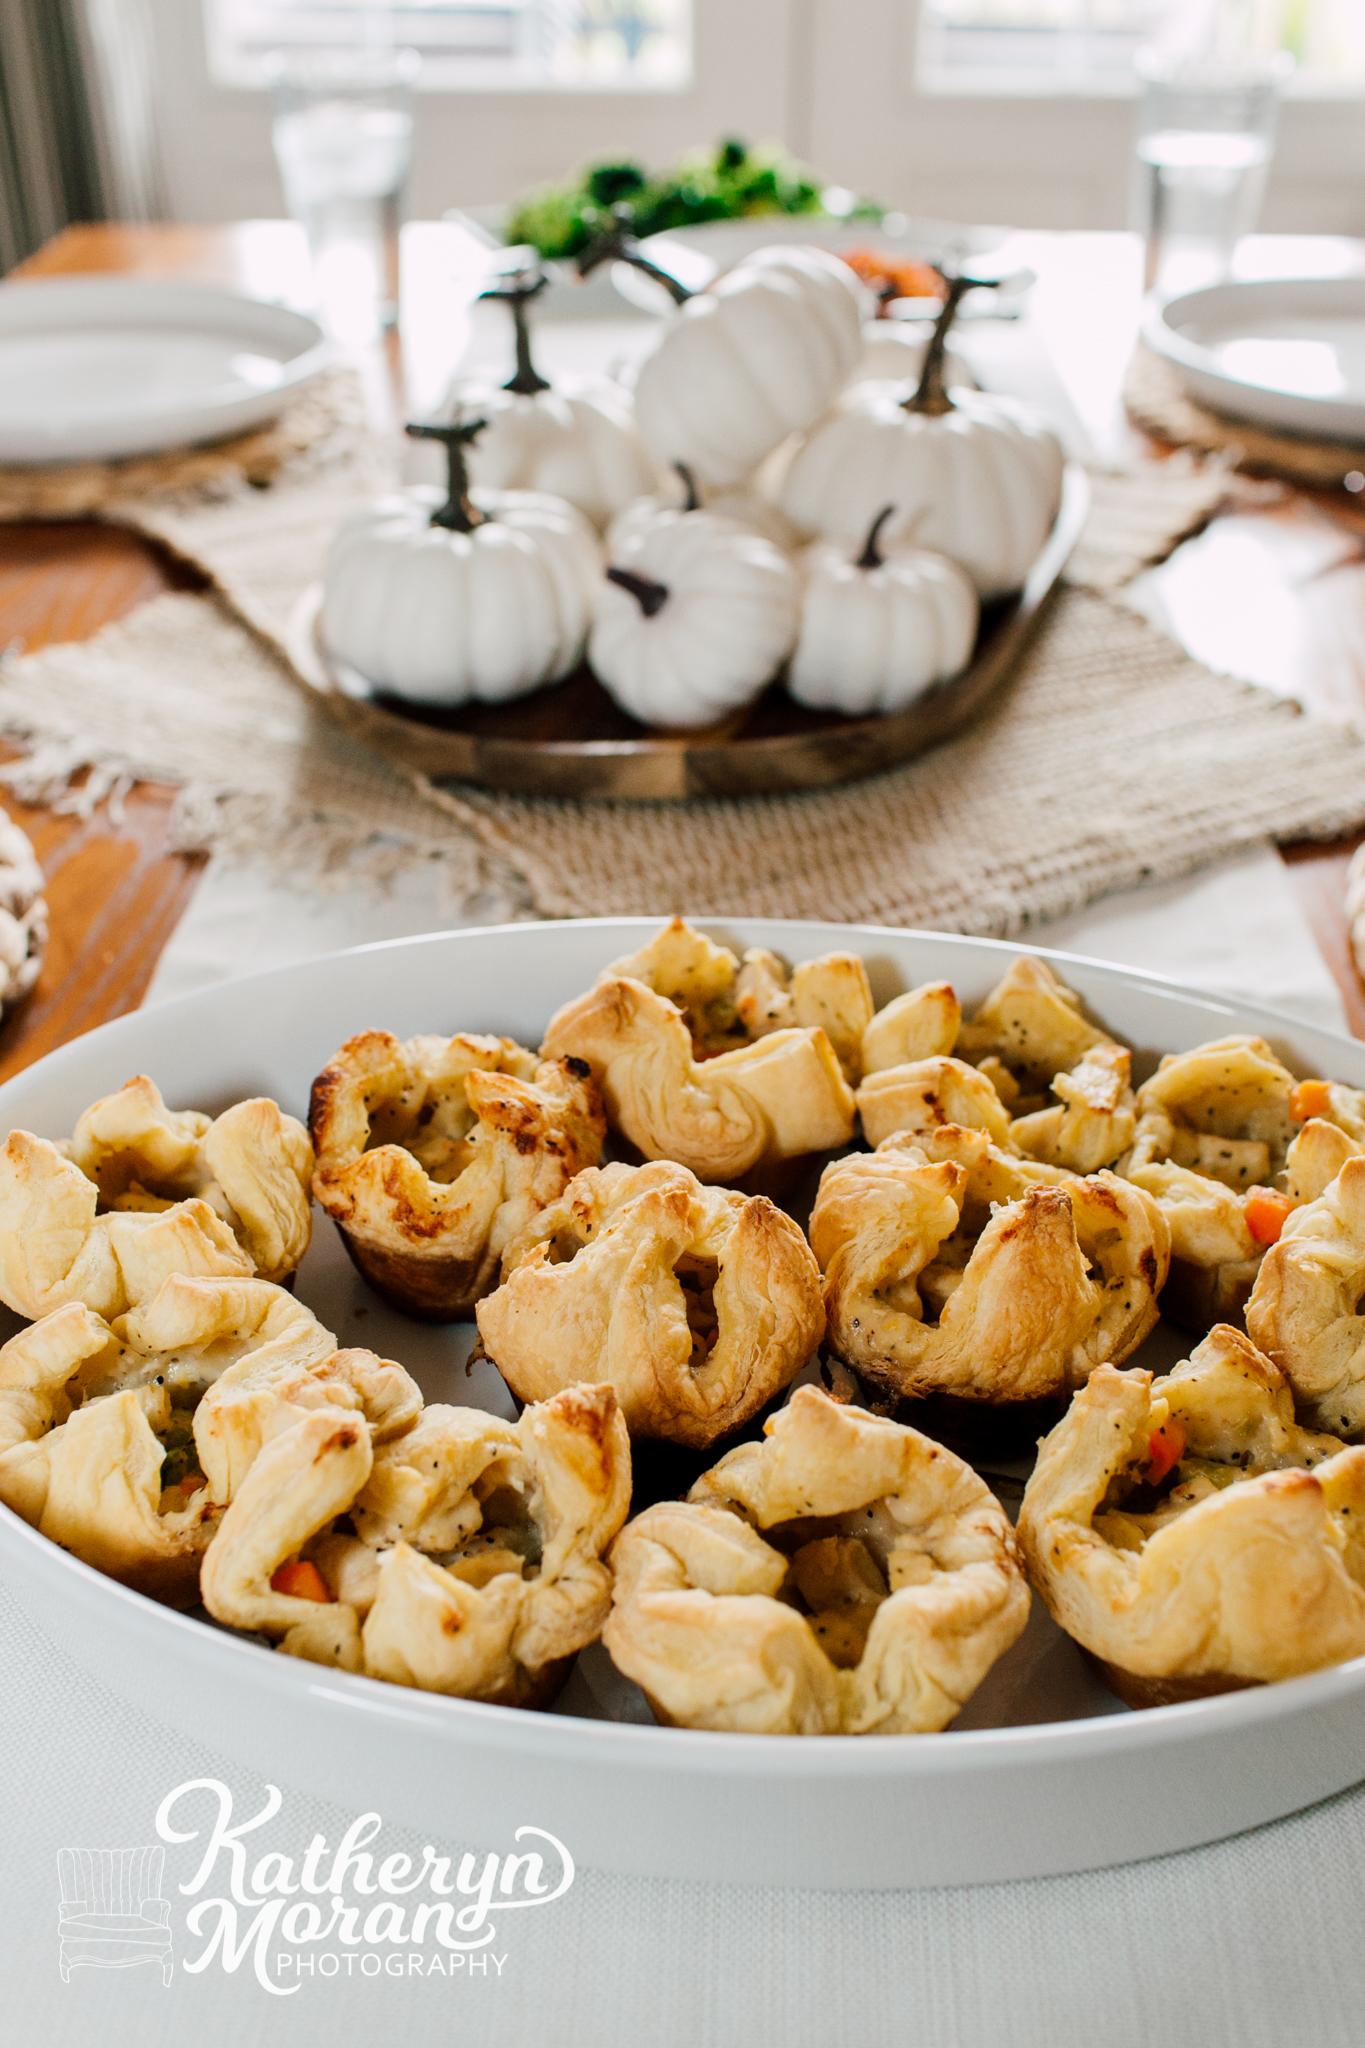 dream-dinners-lifestyle-session-katheryn-moran-2019-13.jpg